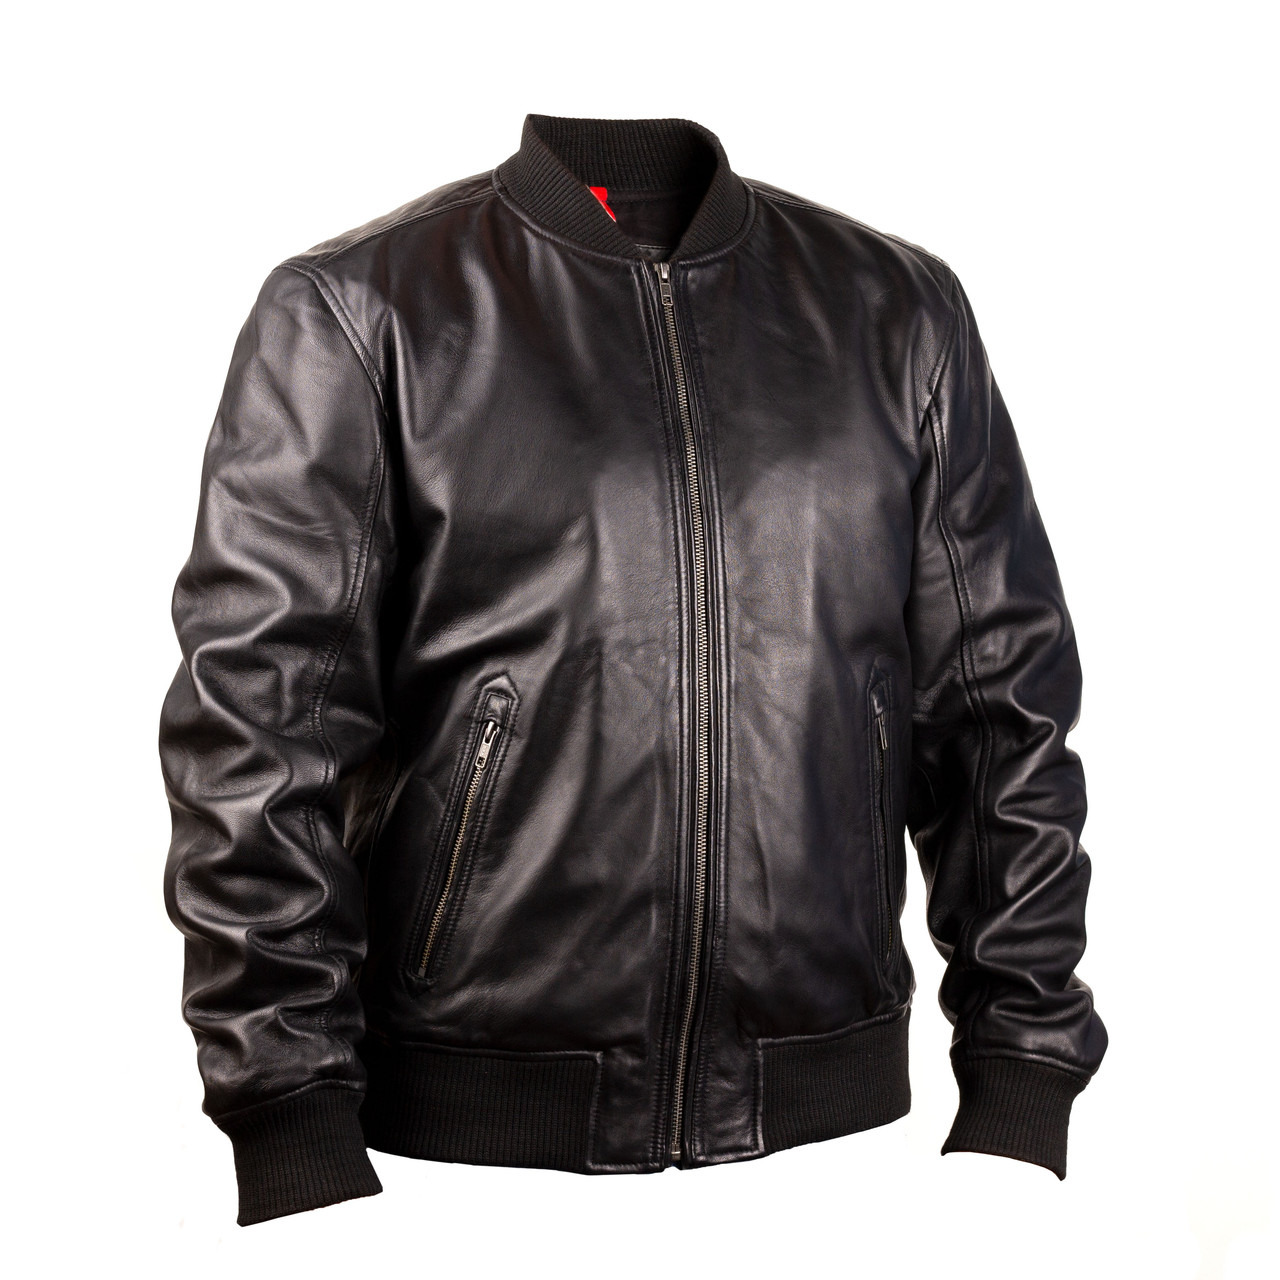 Мужская кожаная куртка бомбер Camden black